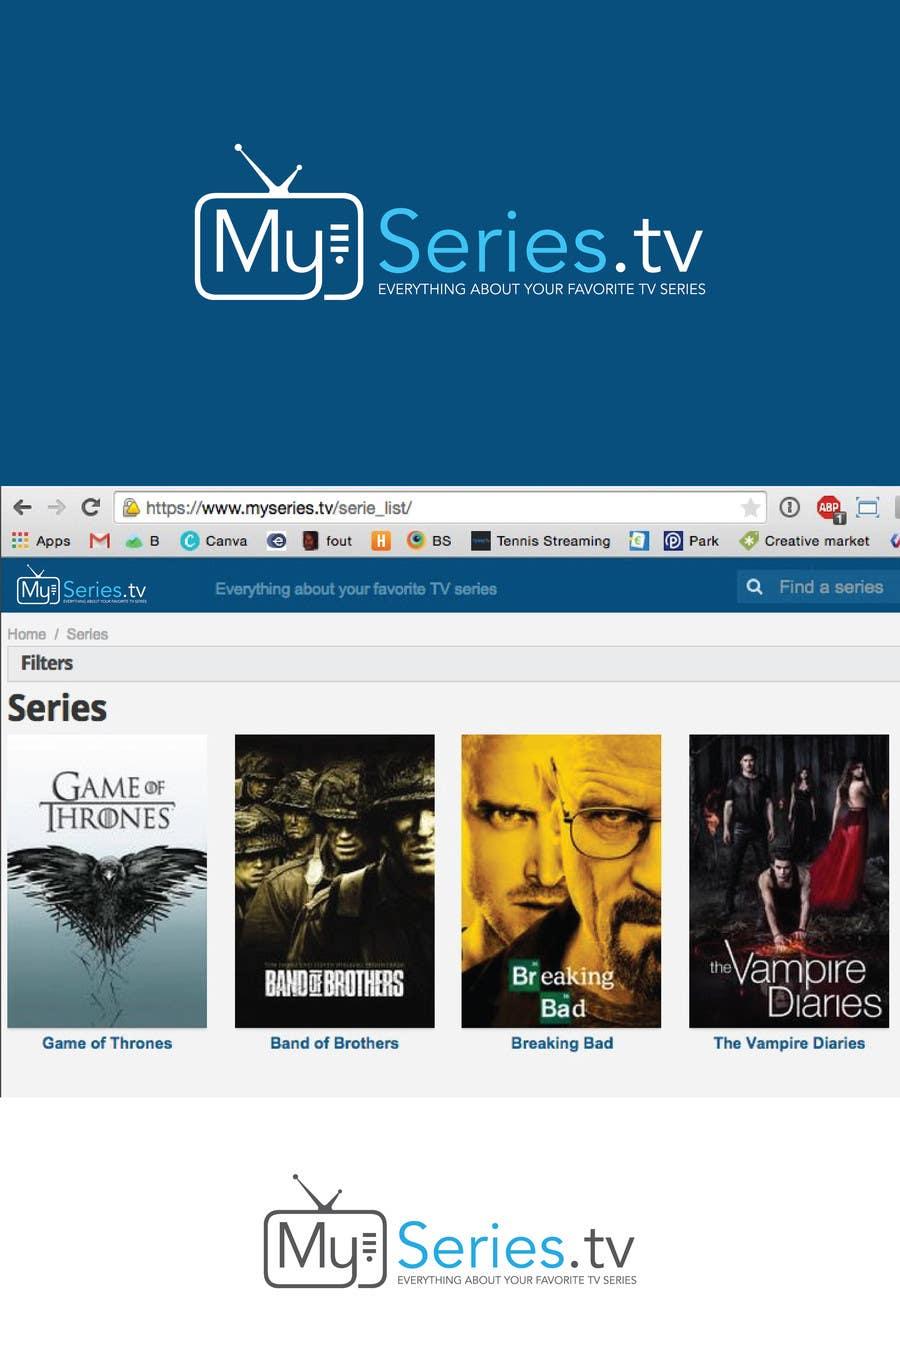 Konkurrenceindlæg #                                        22                                      for                                         Design a Logo for a website about TV series